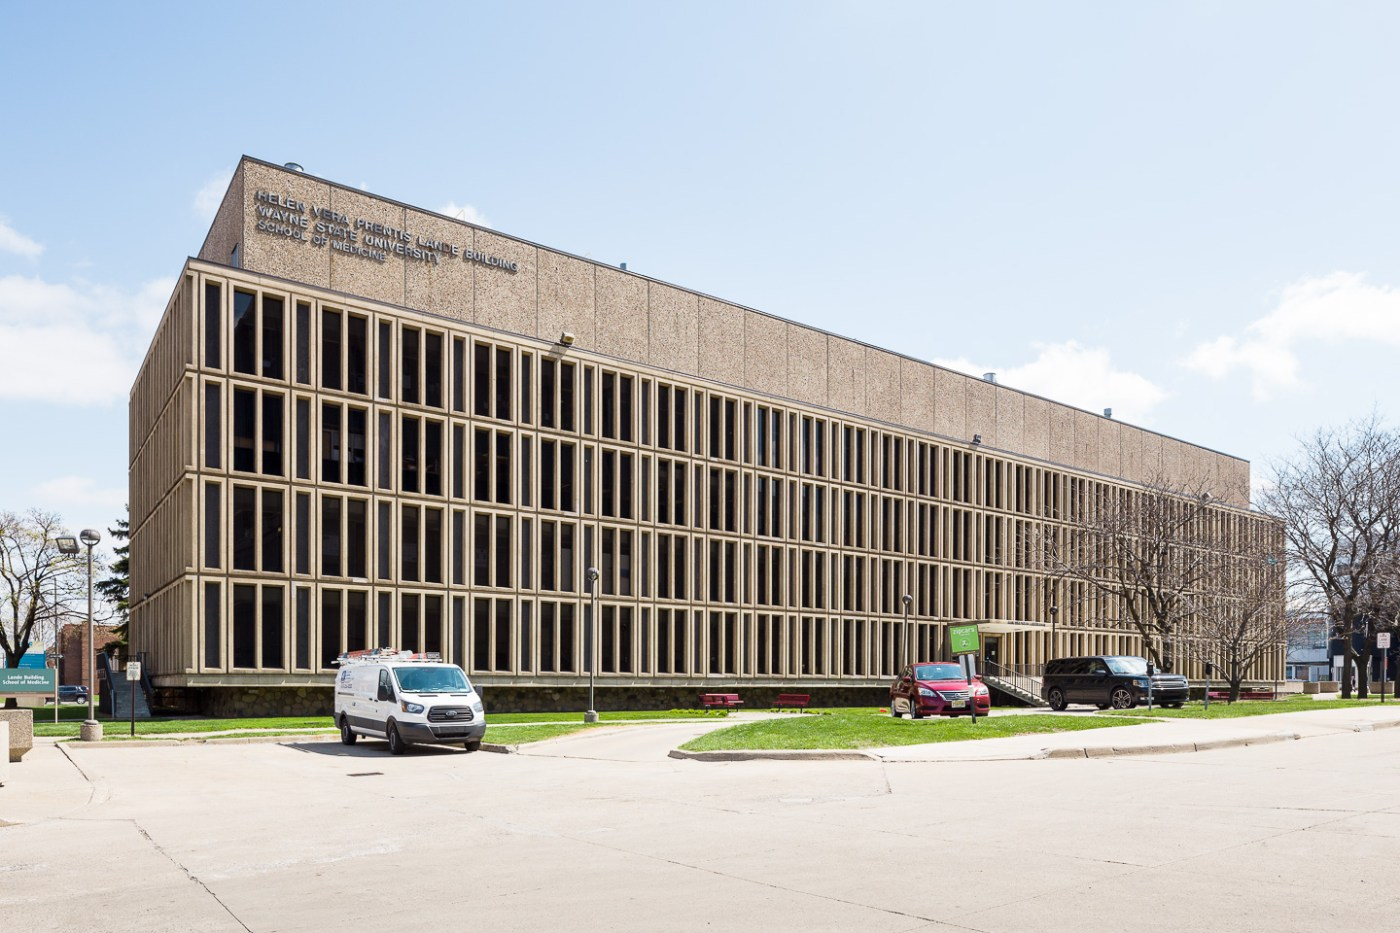 Helen Vera Prentis Land Building in Detroit by Smith, Hinchman & Grylls. Photo by Jason R. Woods.